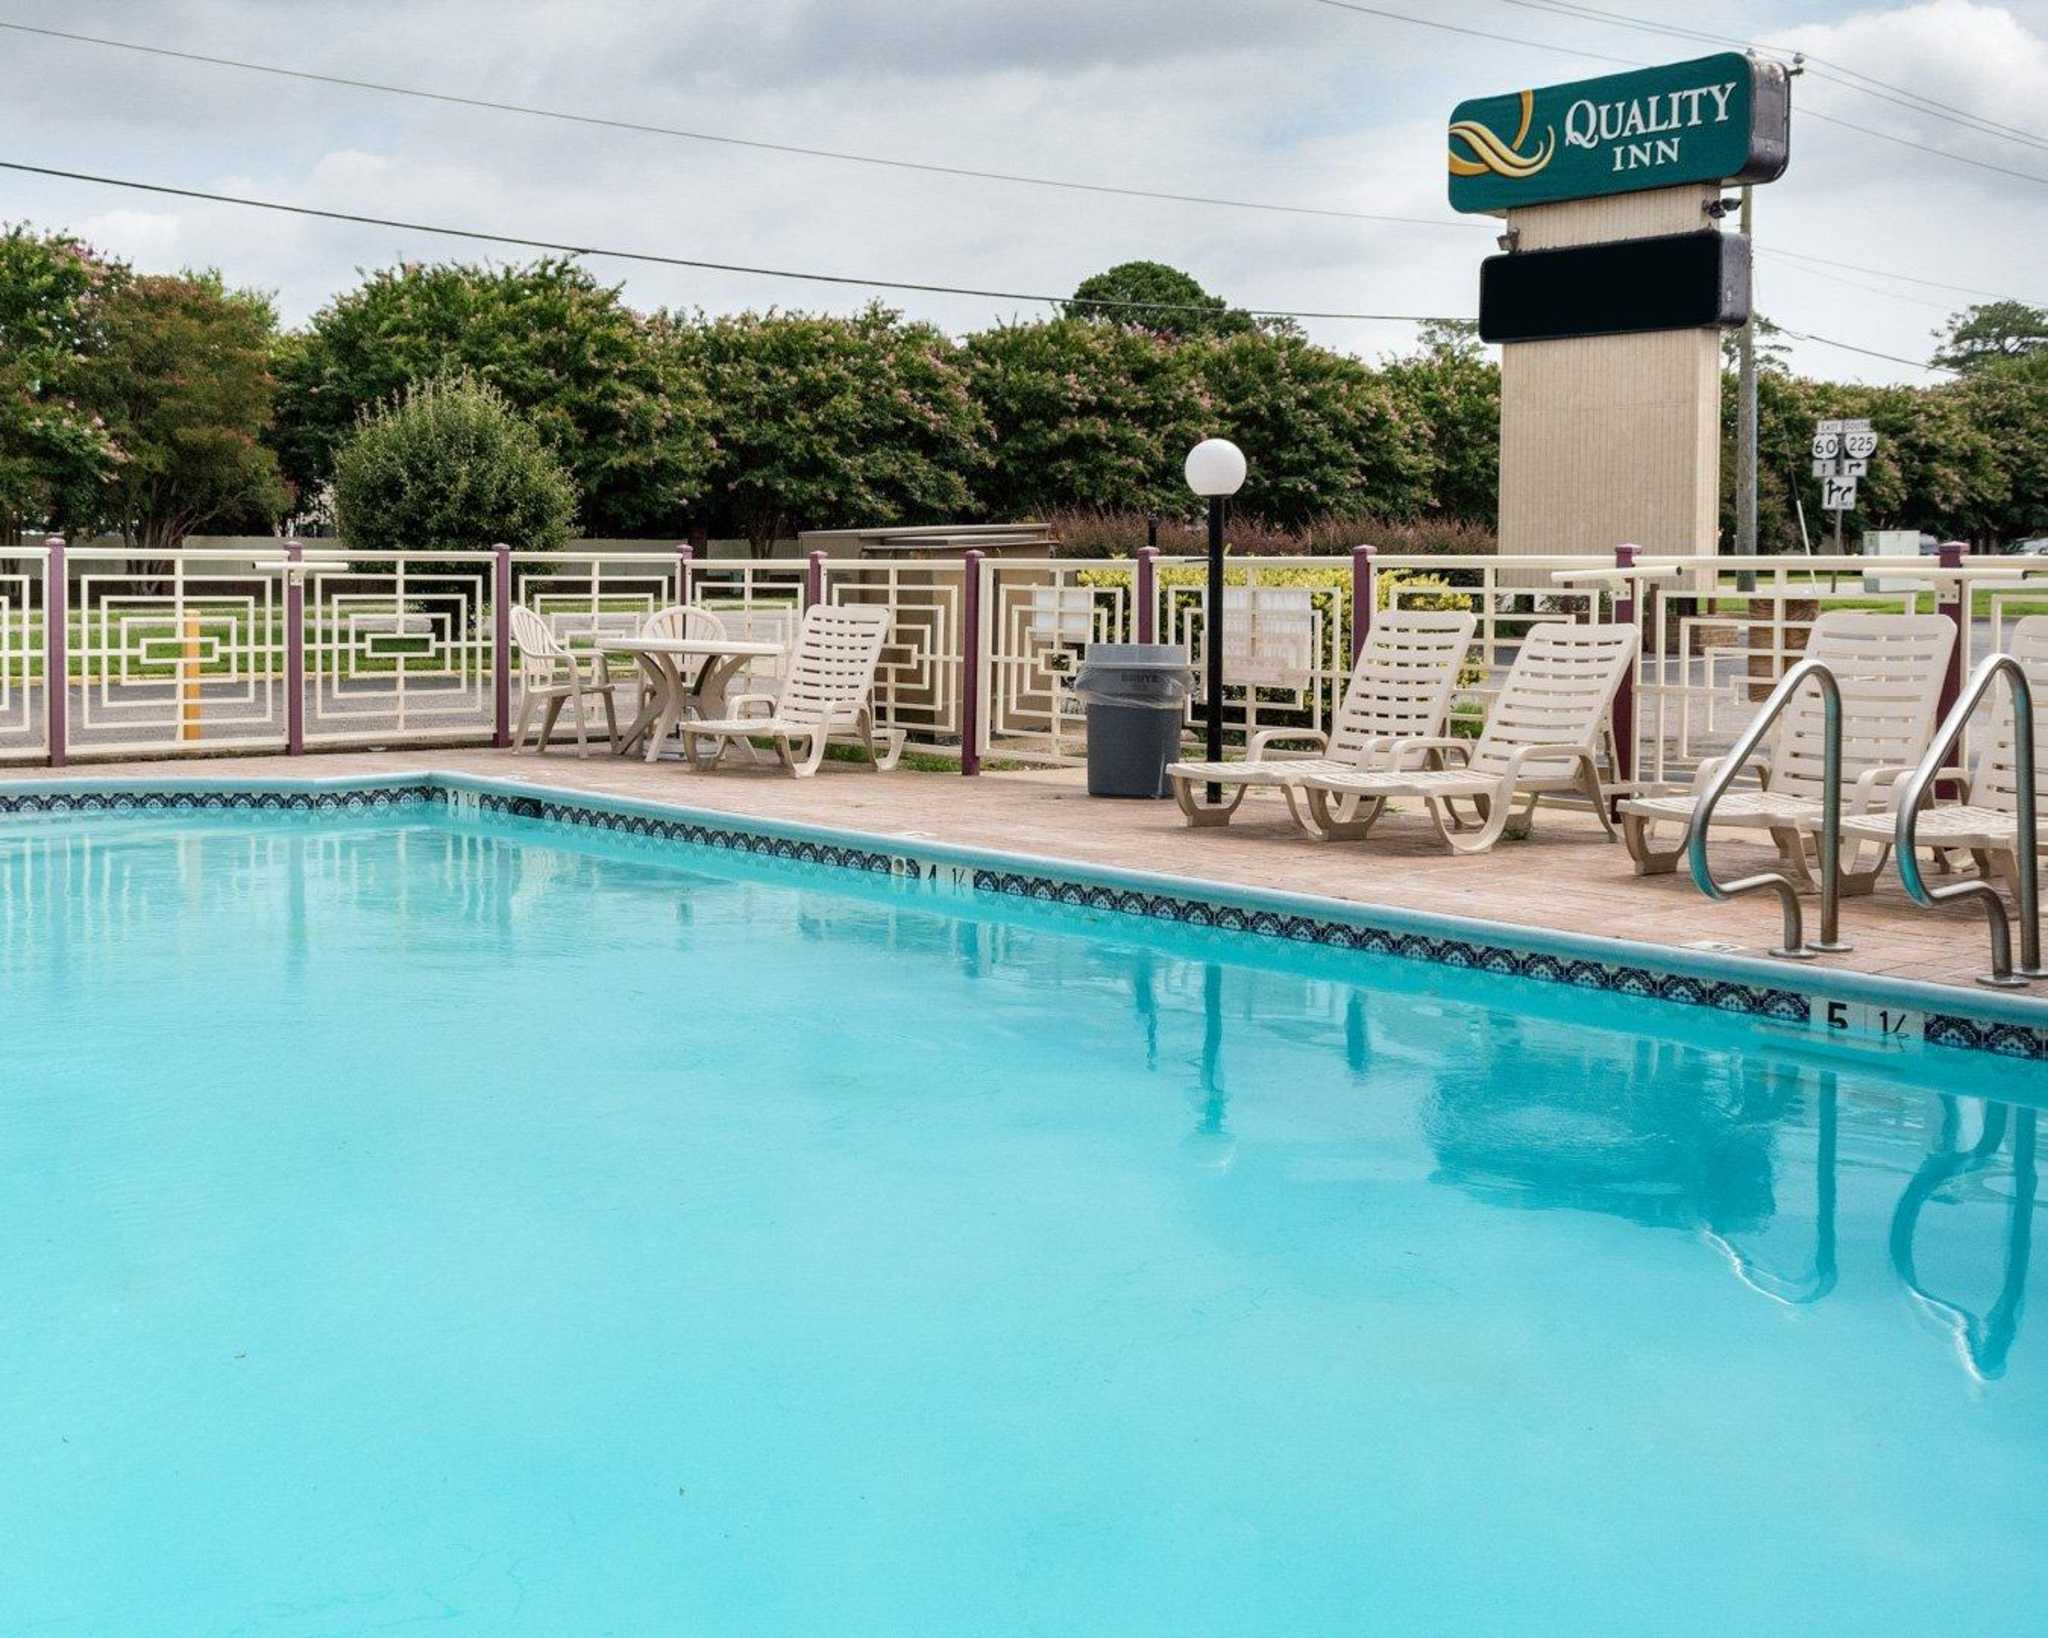 Quality Inn Near Virginia Beach